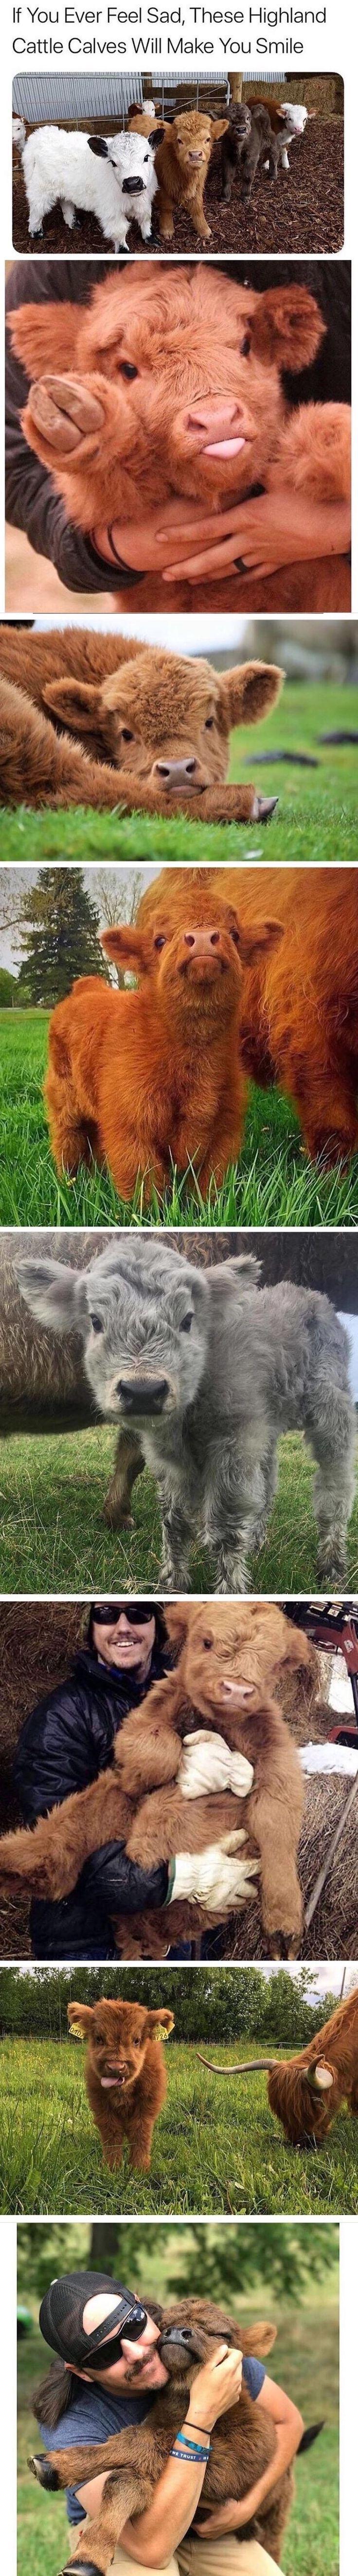 ACH DU LIEBER GOTT !!!!! Soooo süß, dass du Gott liebst !!!!! Soooo süß   – Tierfotografie